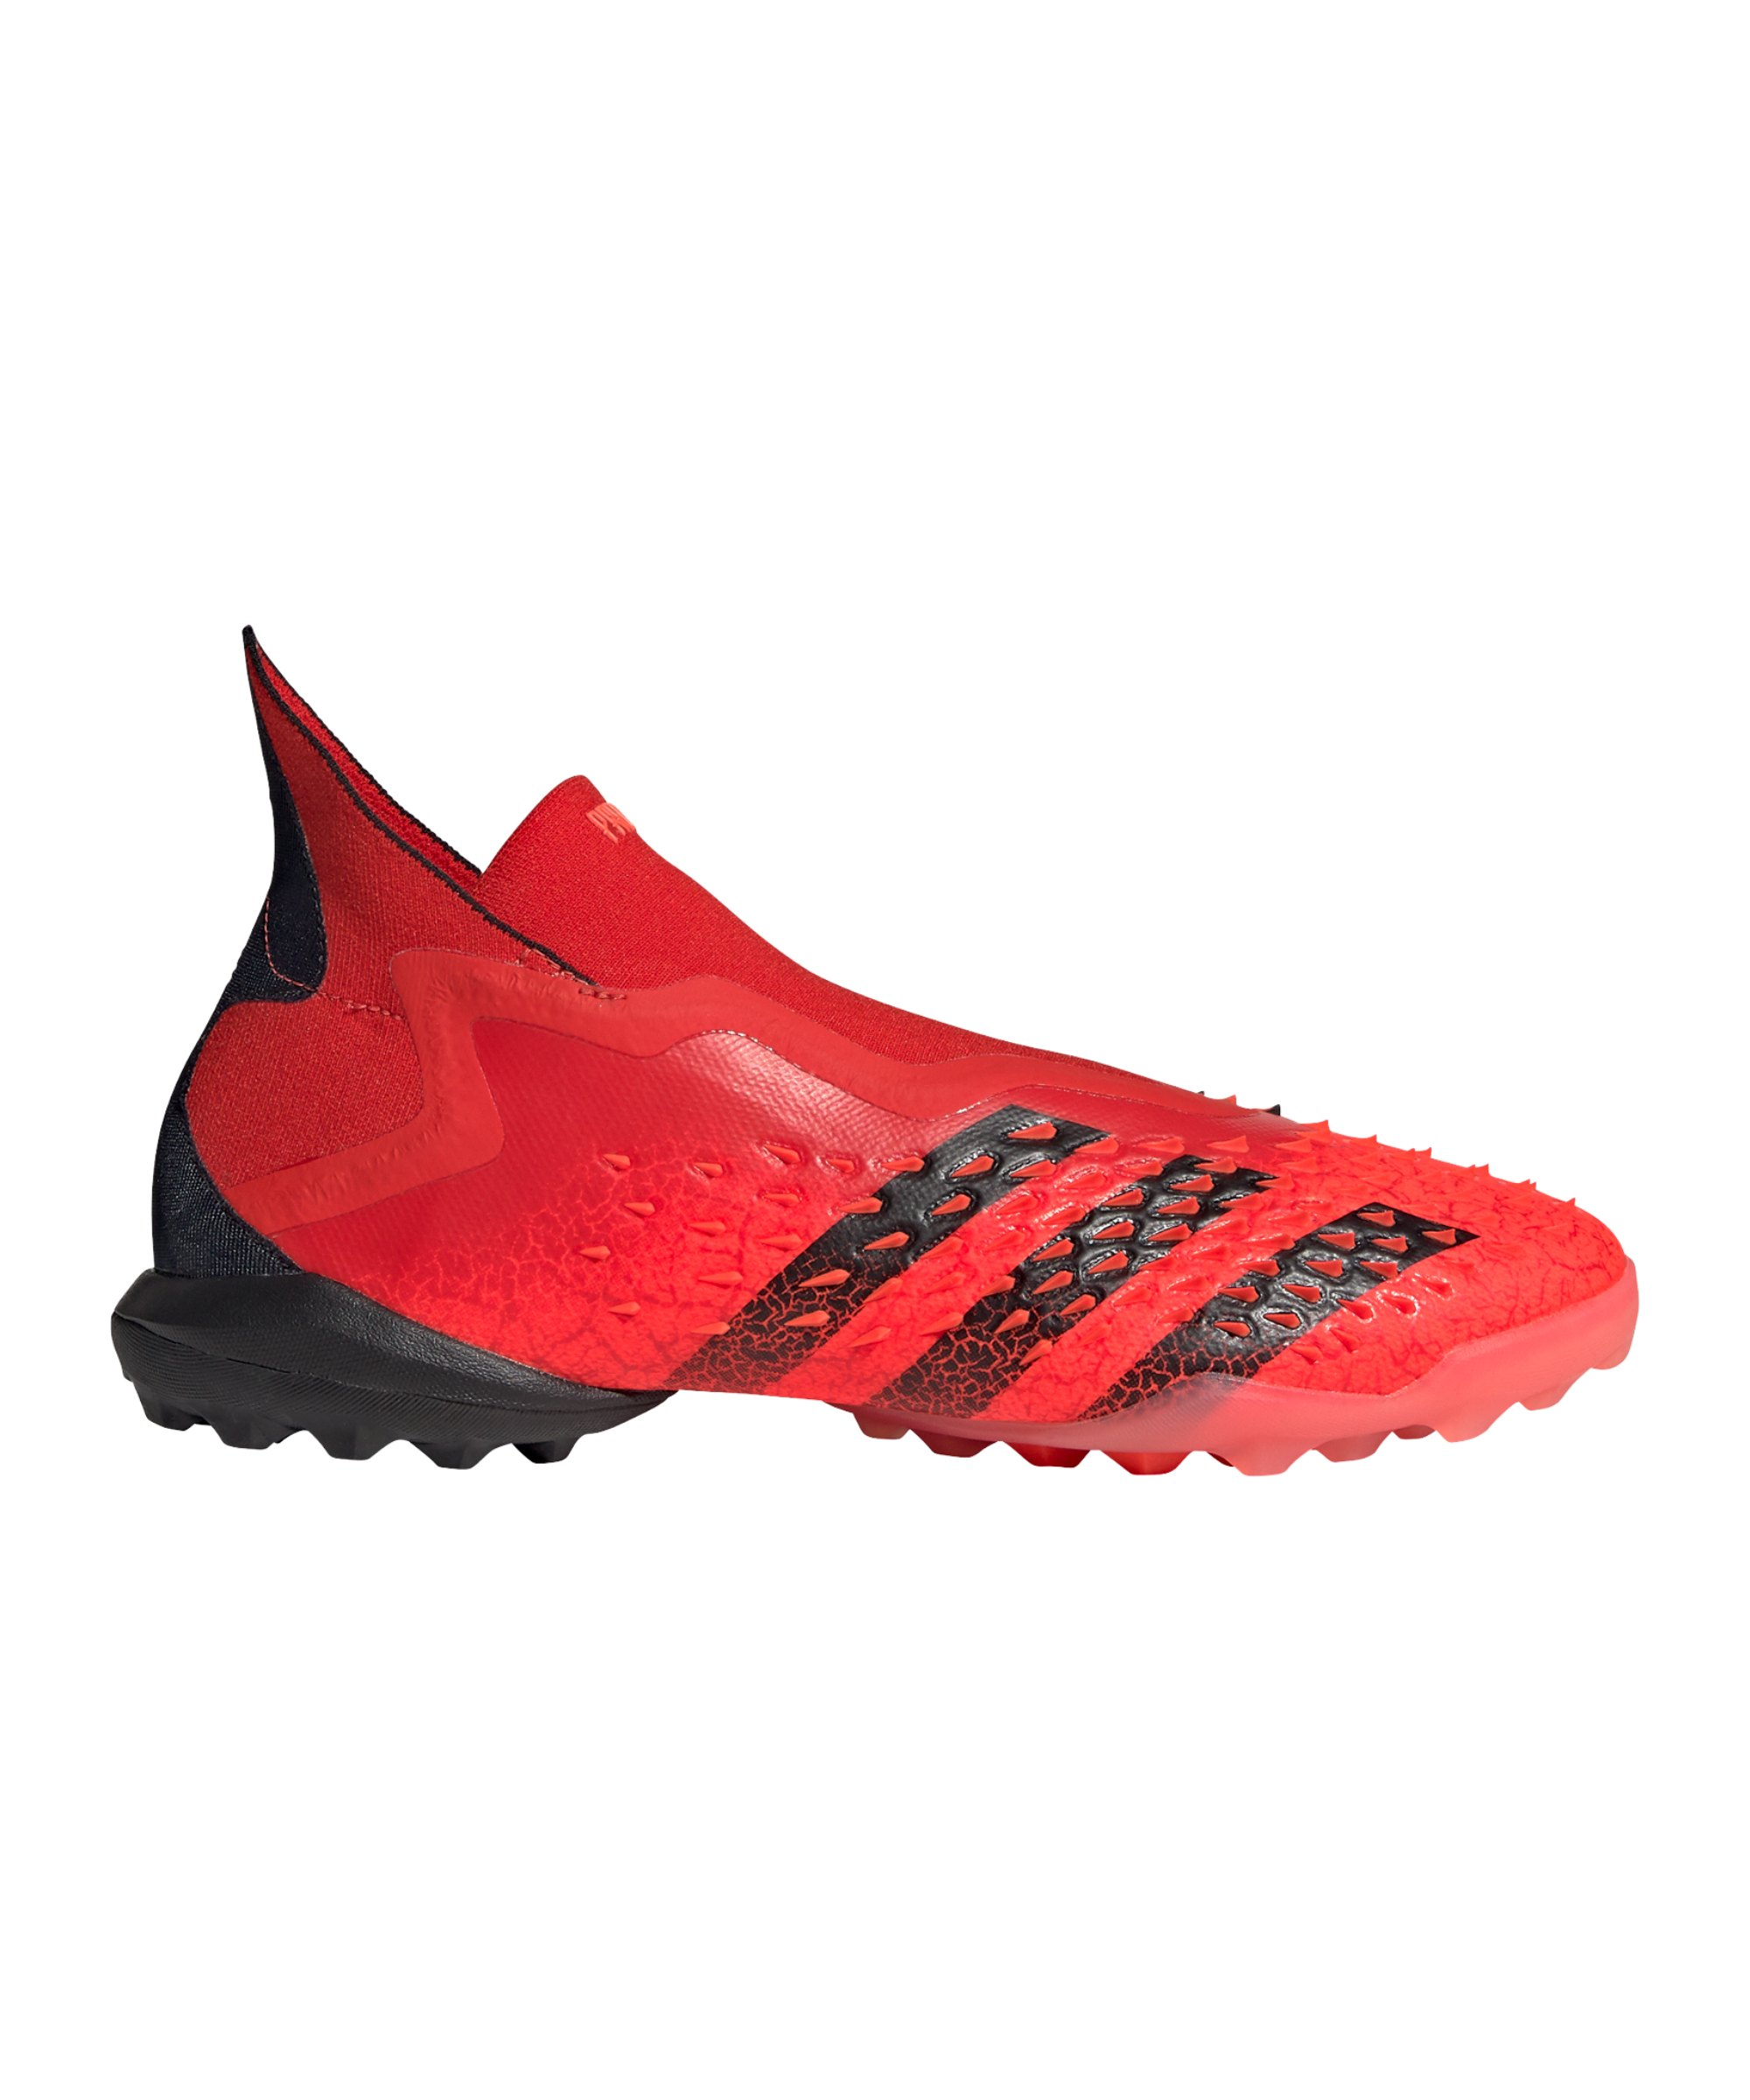 adidas Predator FREAK+ TF Meteorite Rot Schwarz - rot